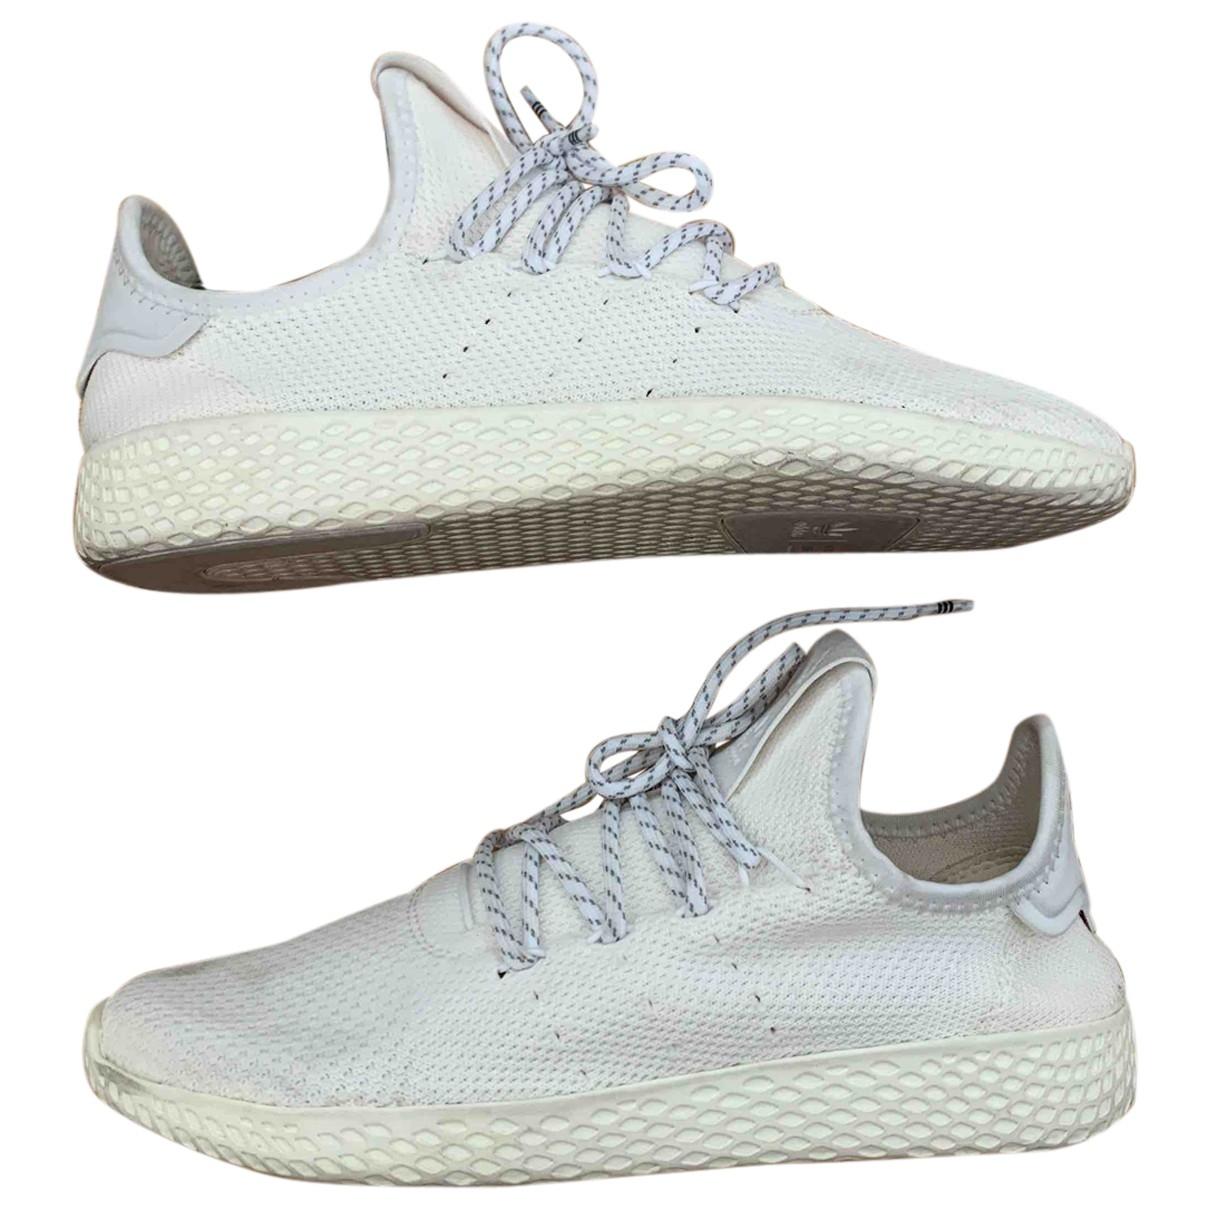 Adidas X Pharrell Williams - Baskets NMD Hu pour femme en toile - blanc